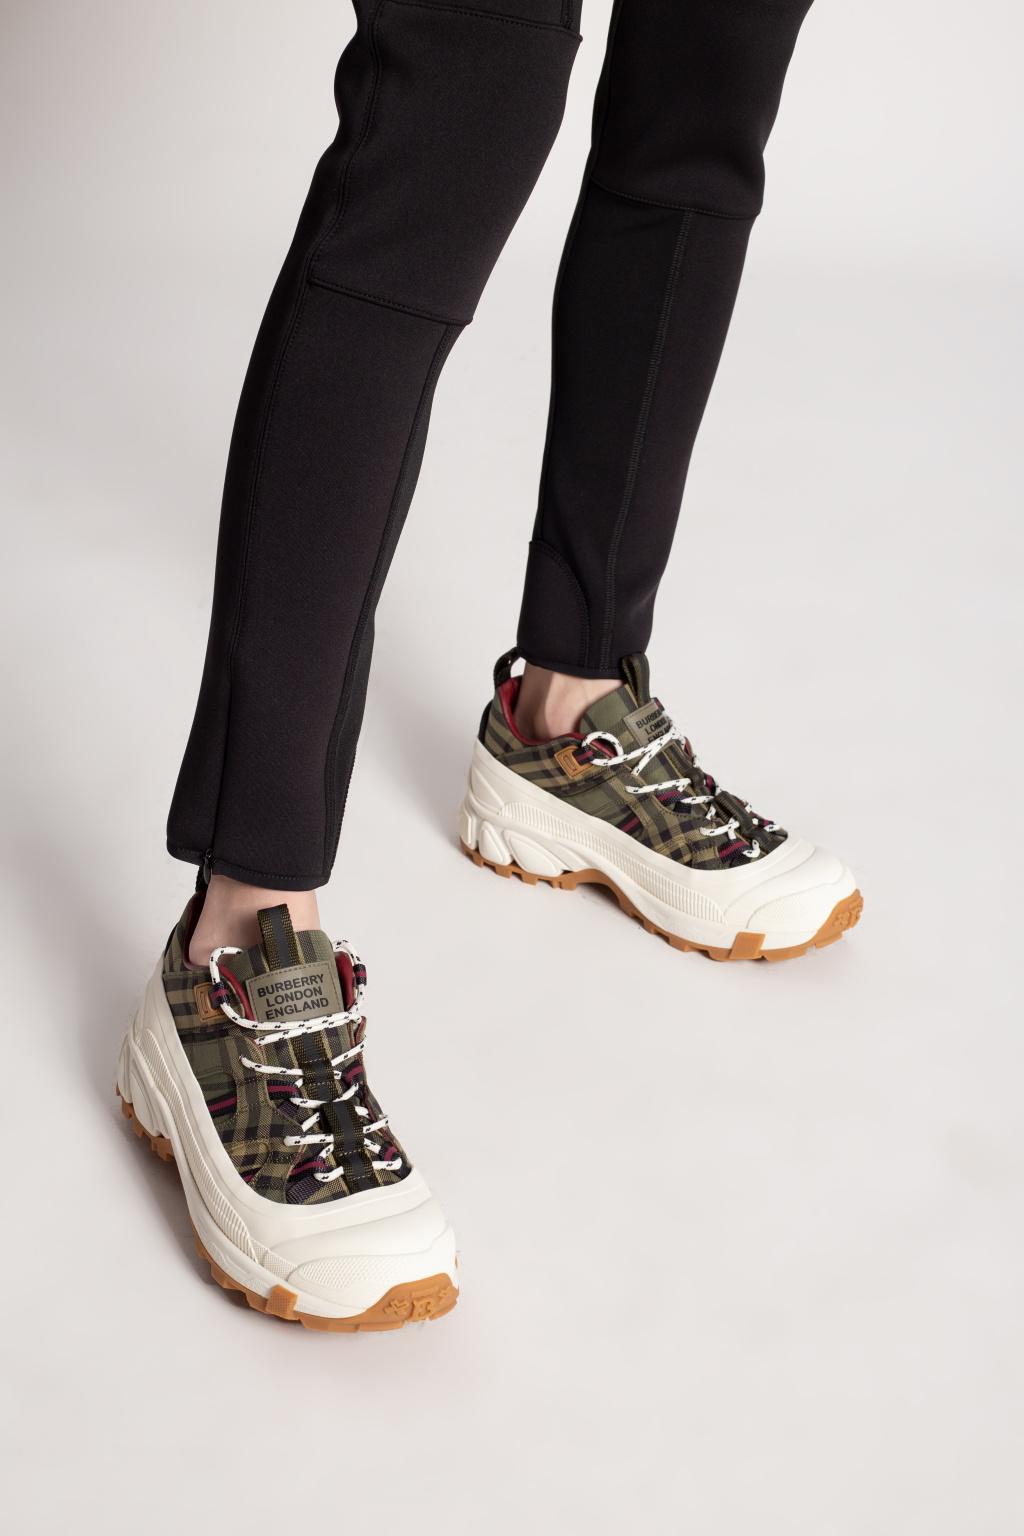 Burberry 'Arthur' platform sneakers